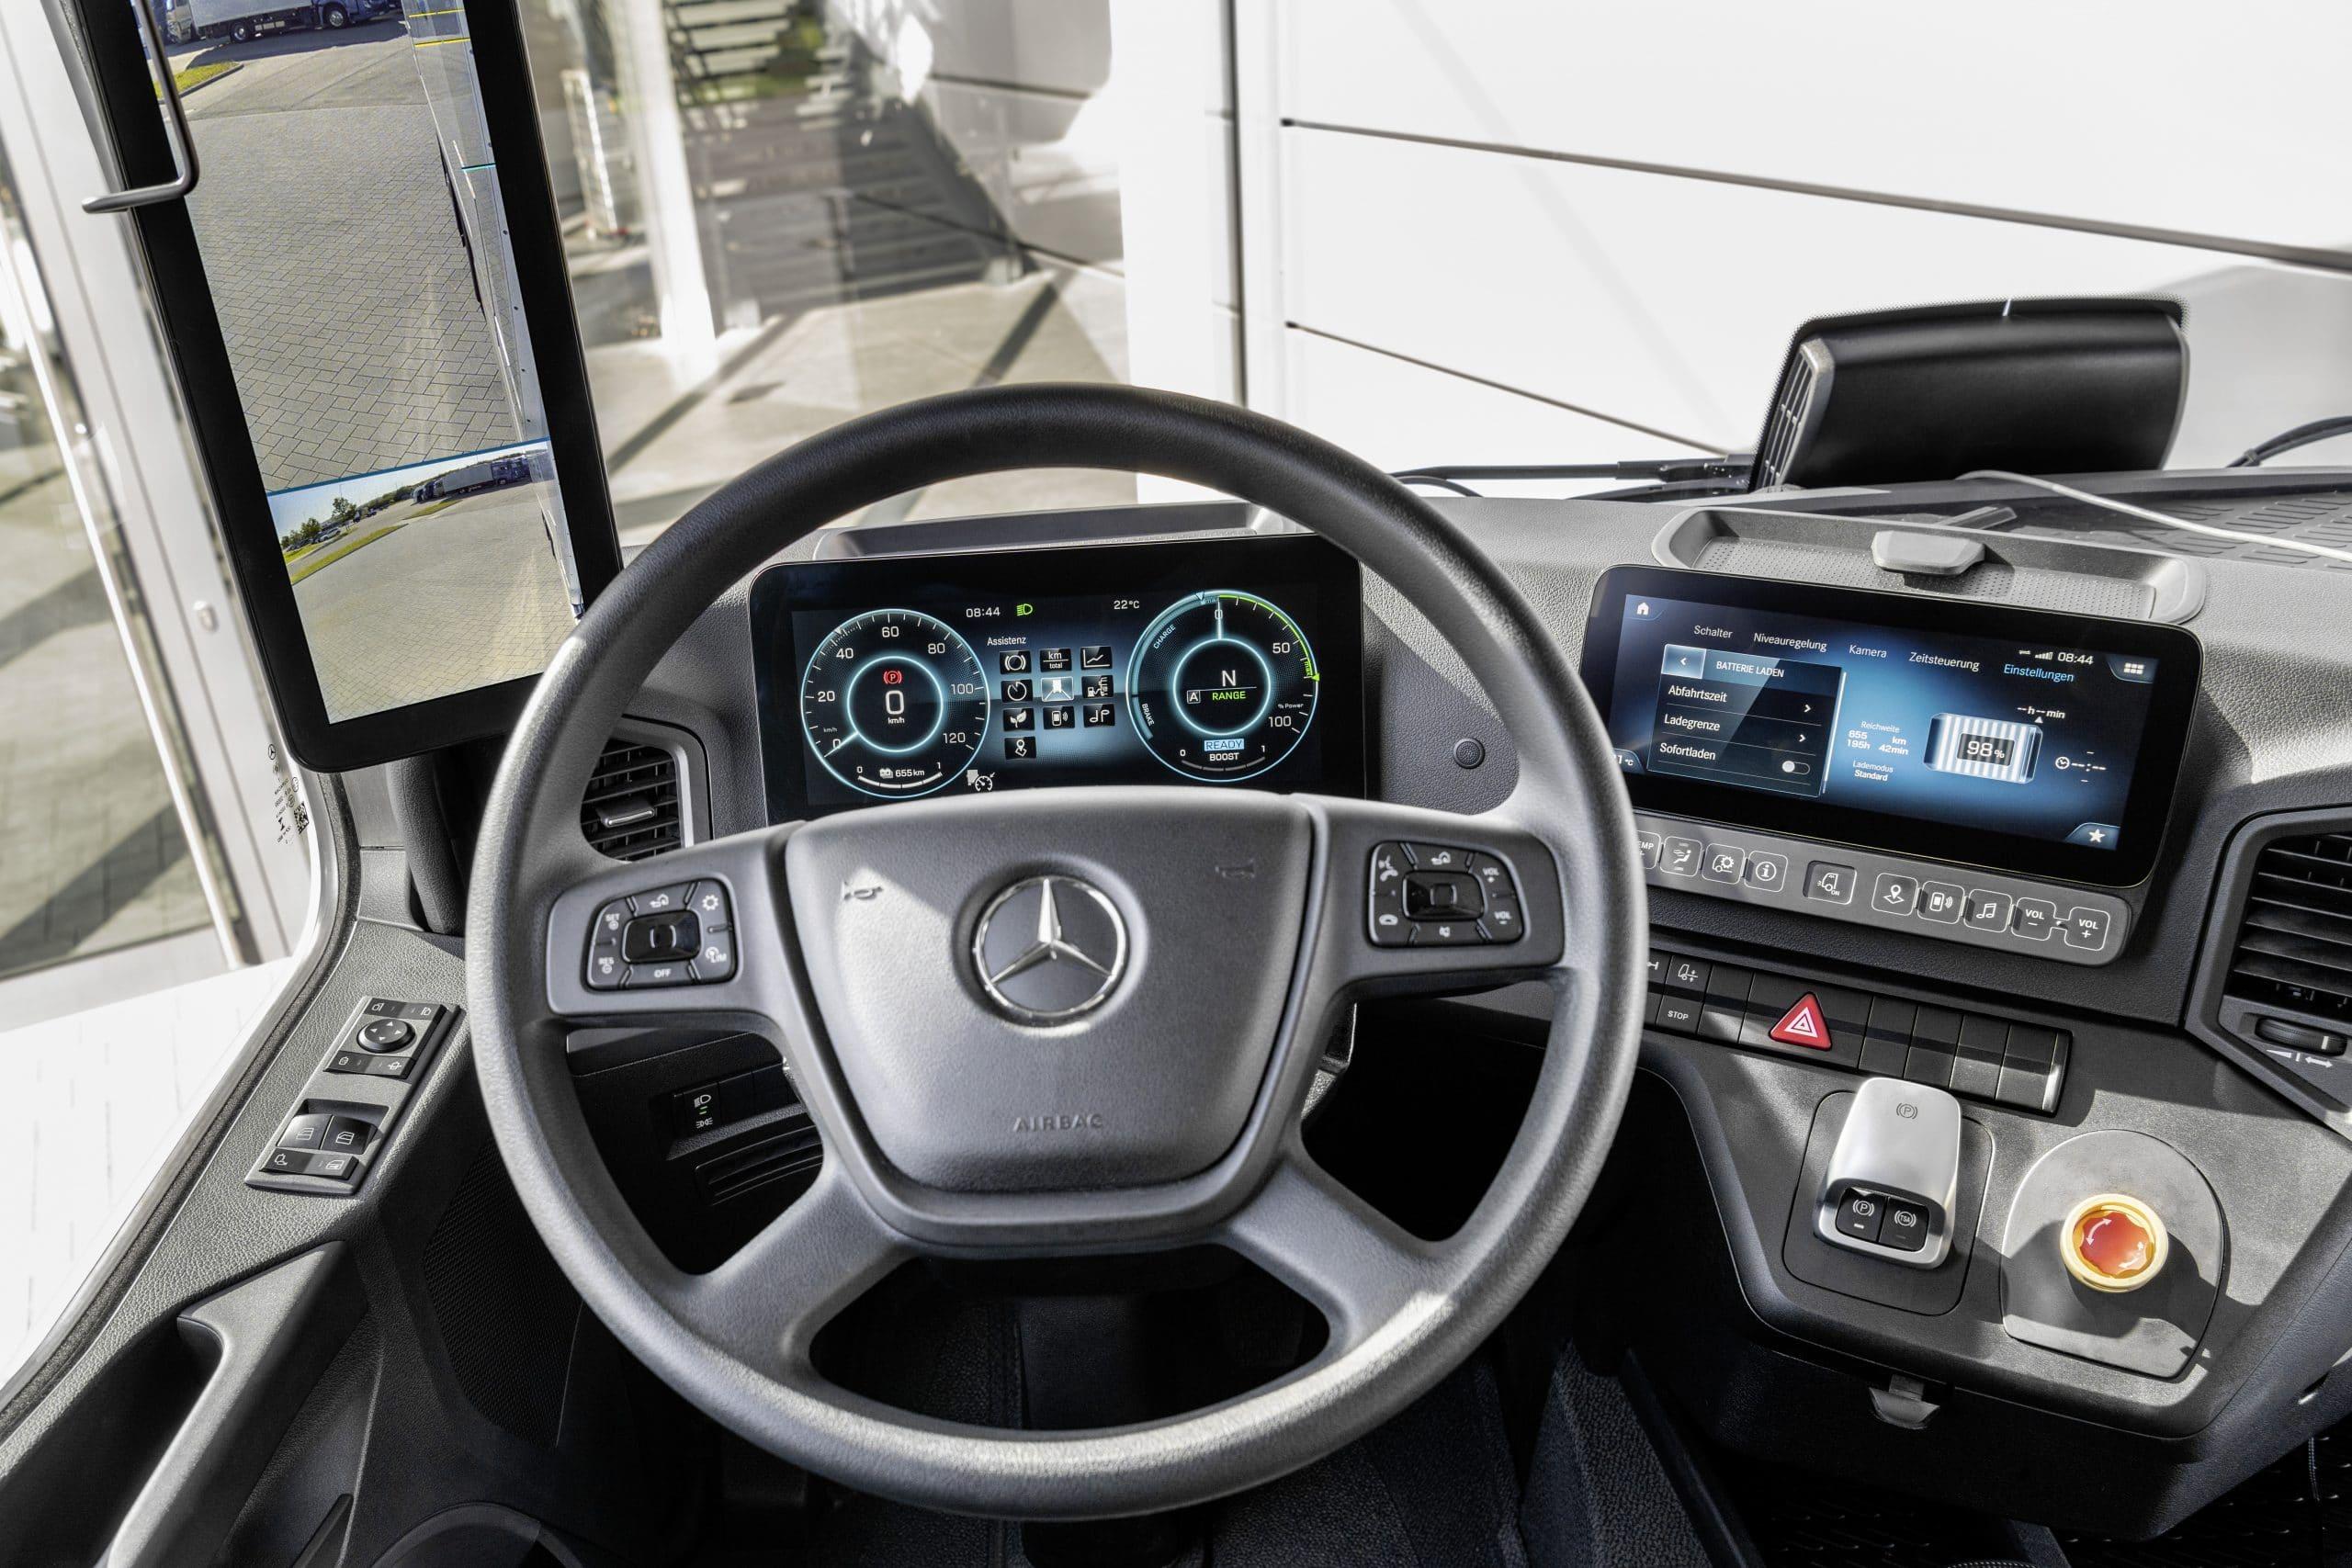 21C0349 057 scaled Το νέο eActros, γίνεται σημείο αναφοράς στις μεταφορές χωρίς ρύπους electric trucks, Mercedes, Mercedes Actros, Mercedes Benz, Mercedes eActros, ειδήσεις, Επαγγελματικά, ηλεκτρικά, Νέα, Φορτηγά